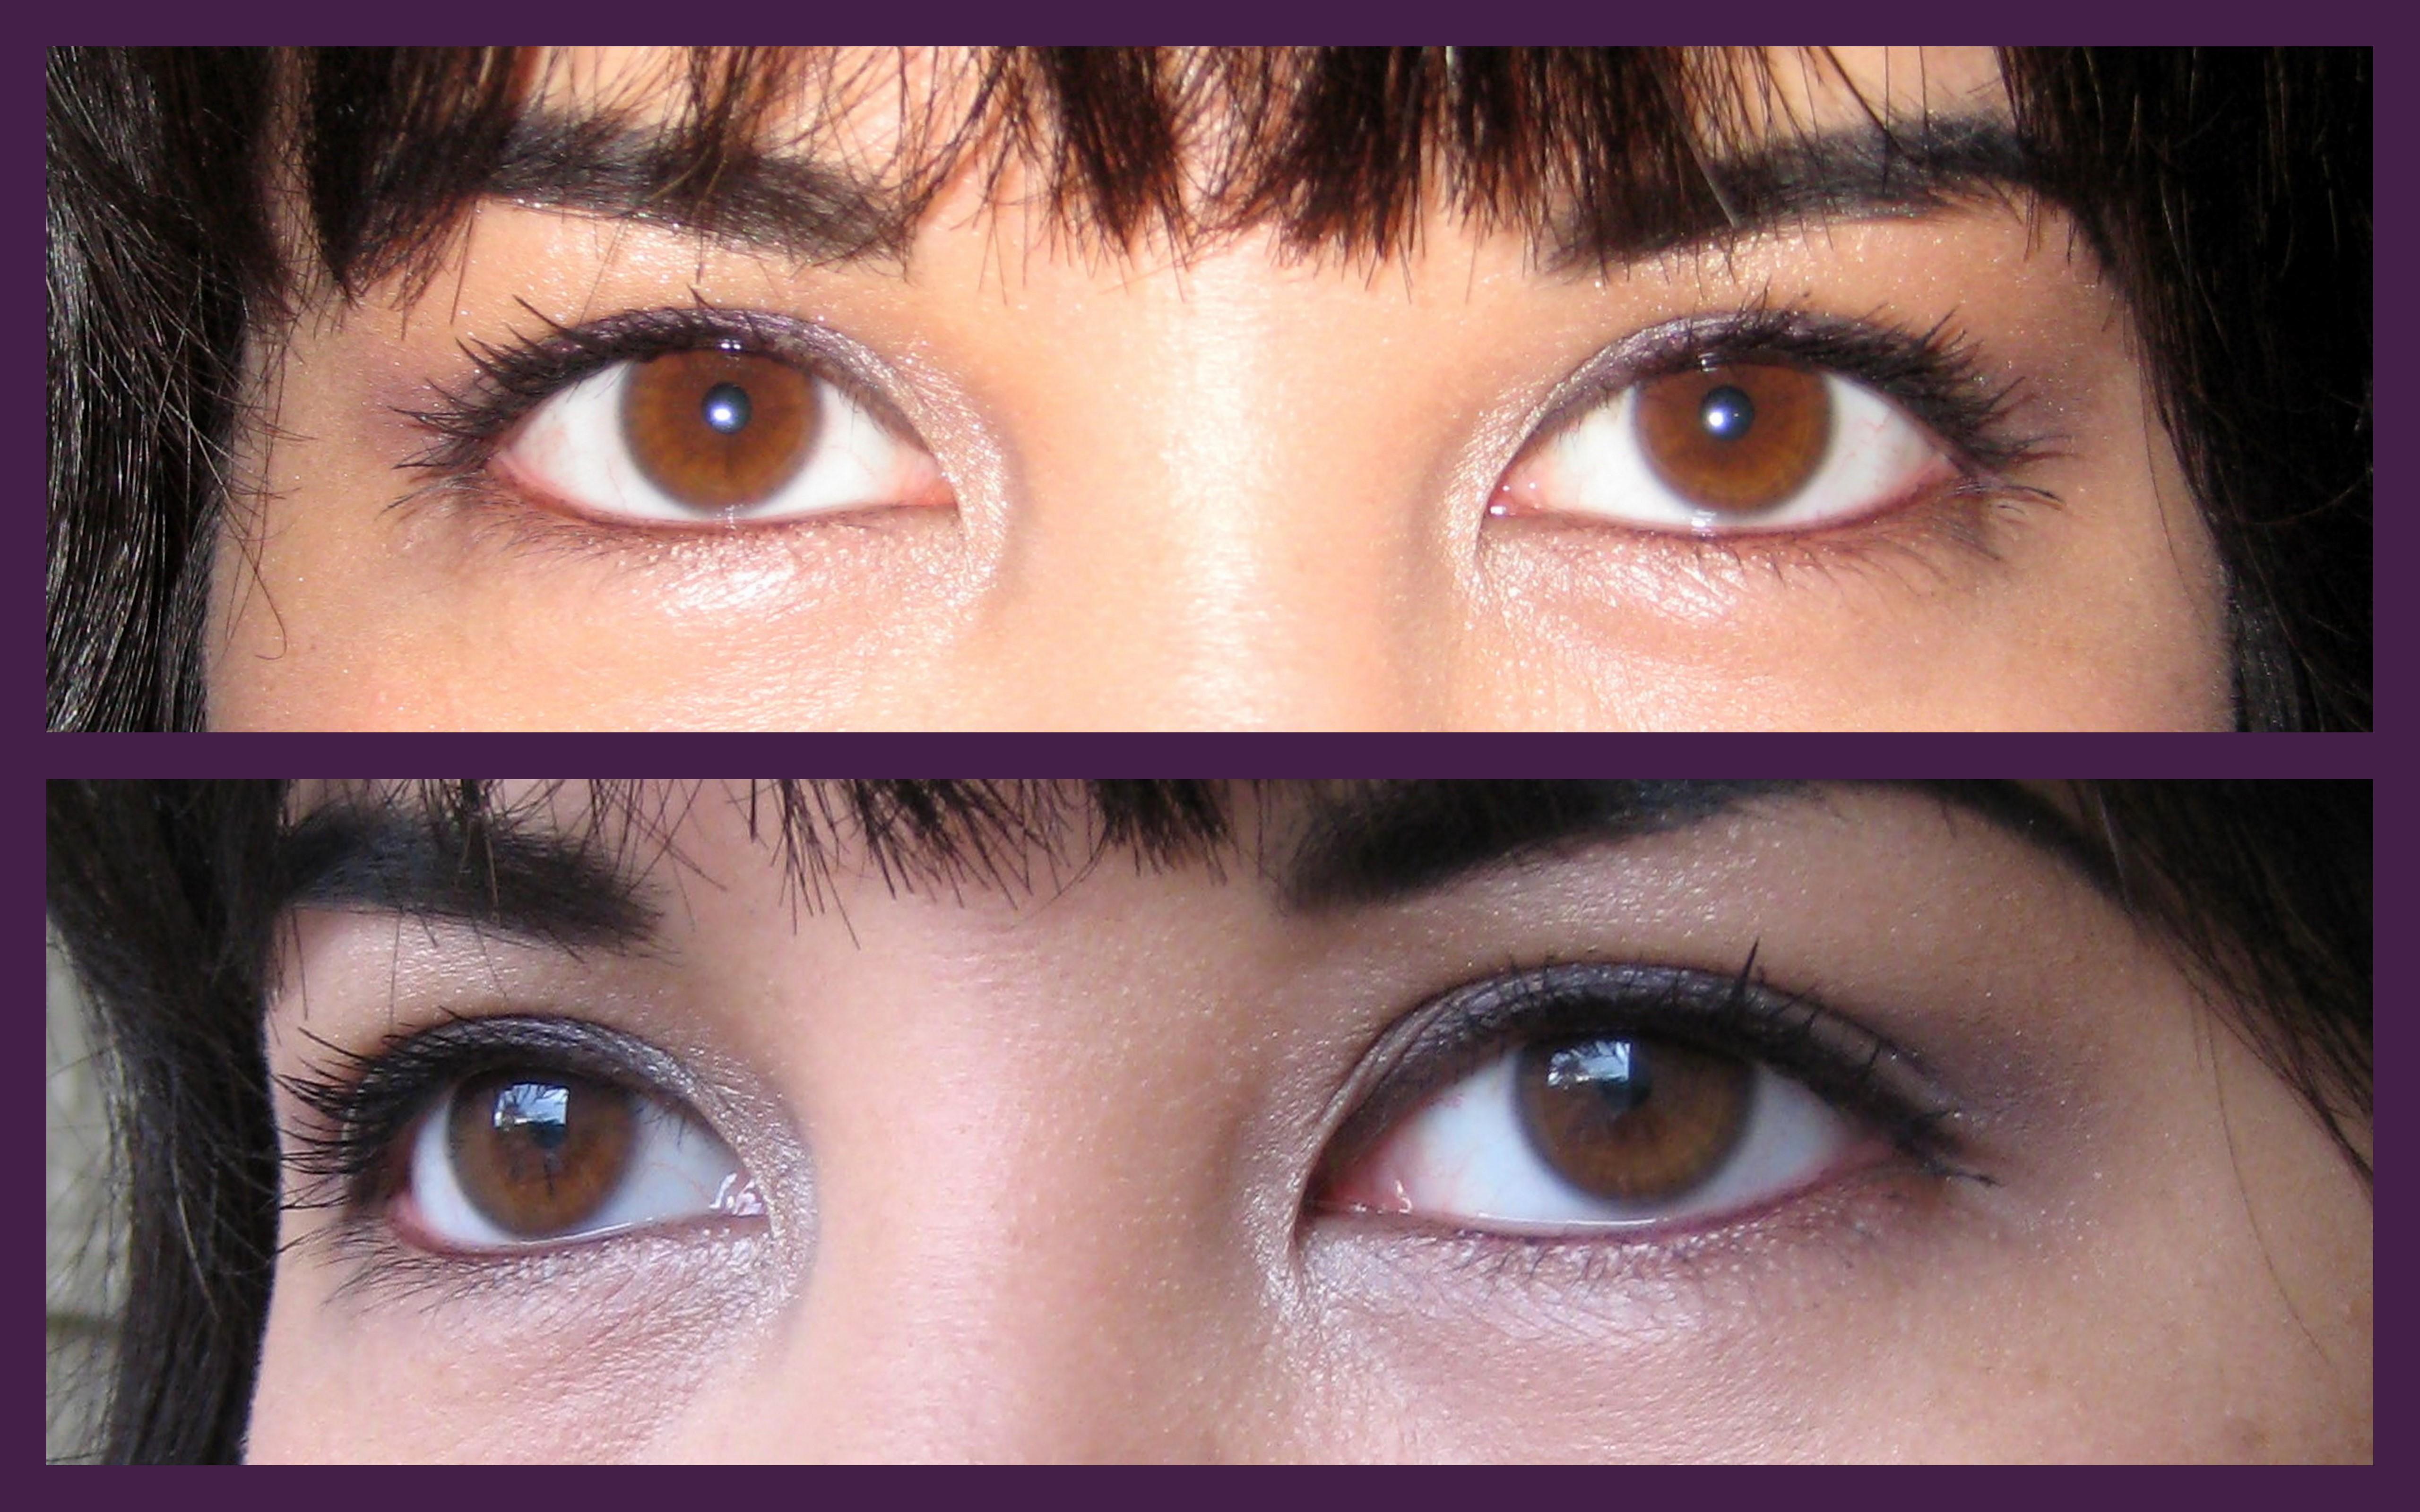 Two close-up photos of Jenn wearing Urban Decay Eye Pencil in Rockstar